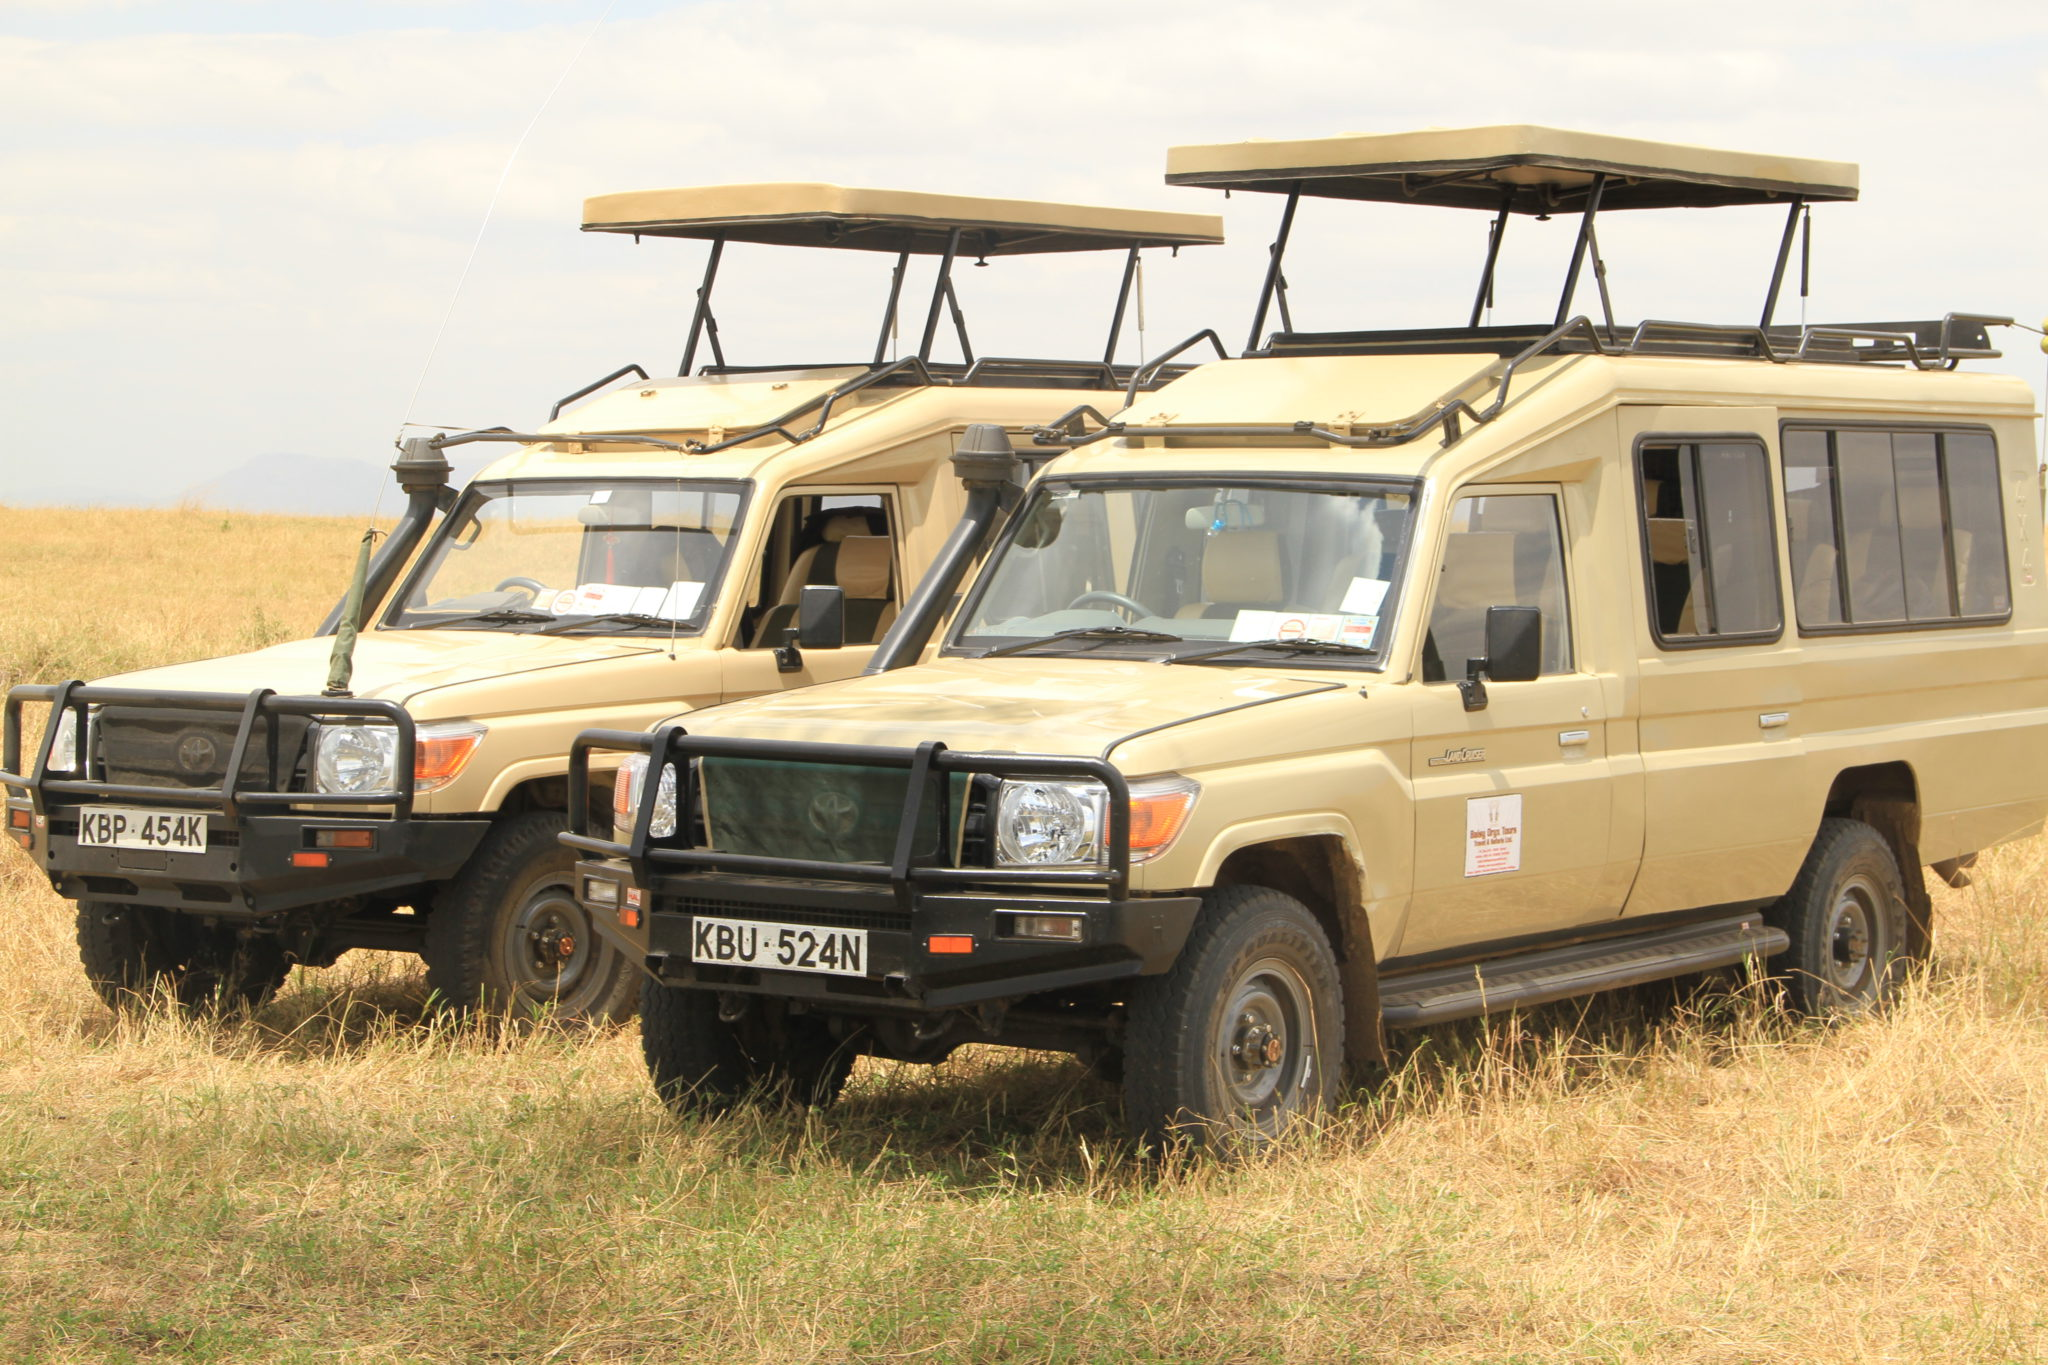 6 Day Amboseli, Nakuru, Naivasha & Masai Mara Luxury Safari